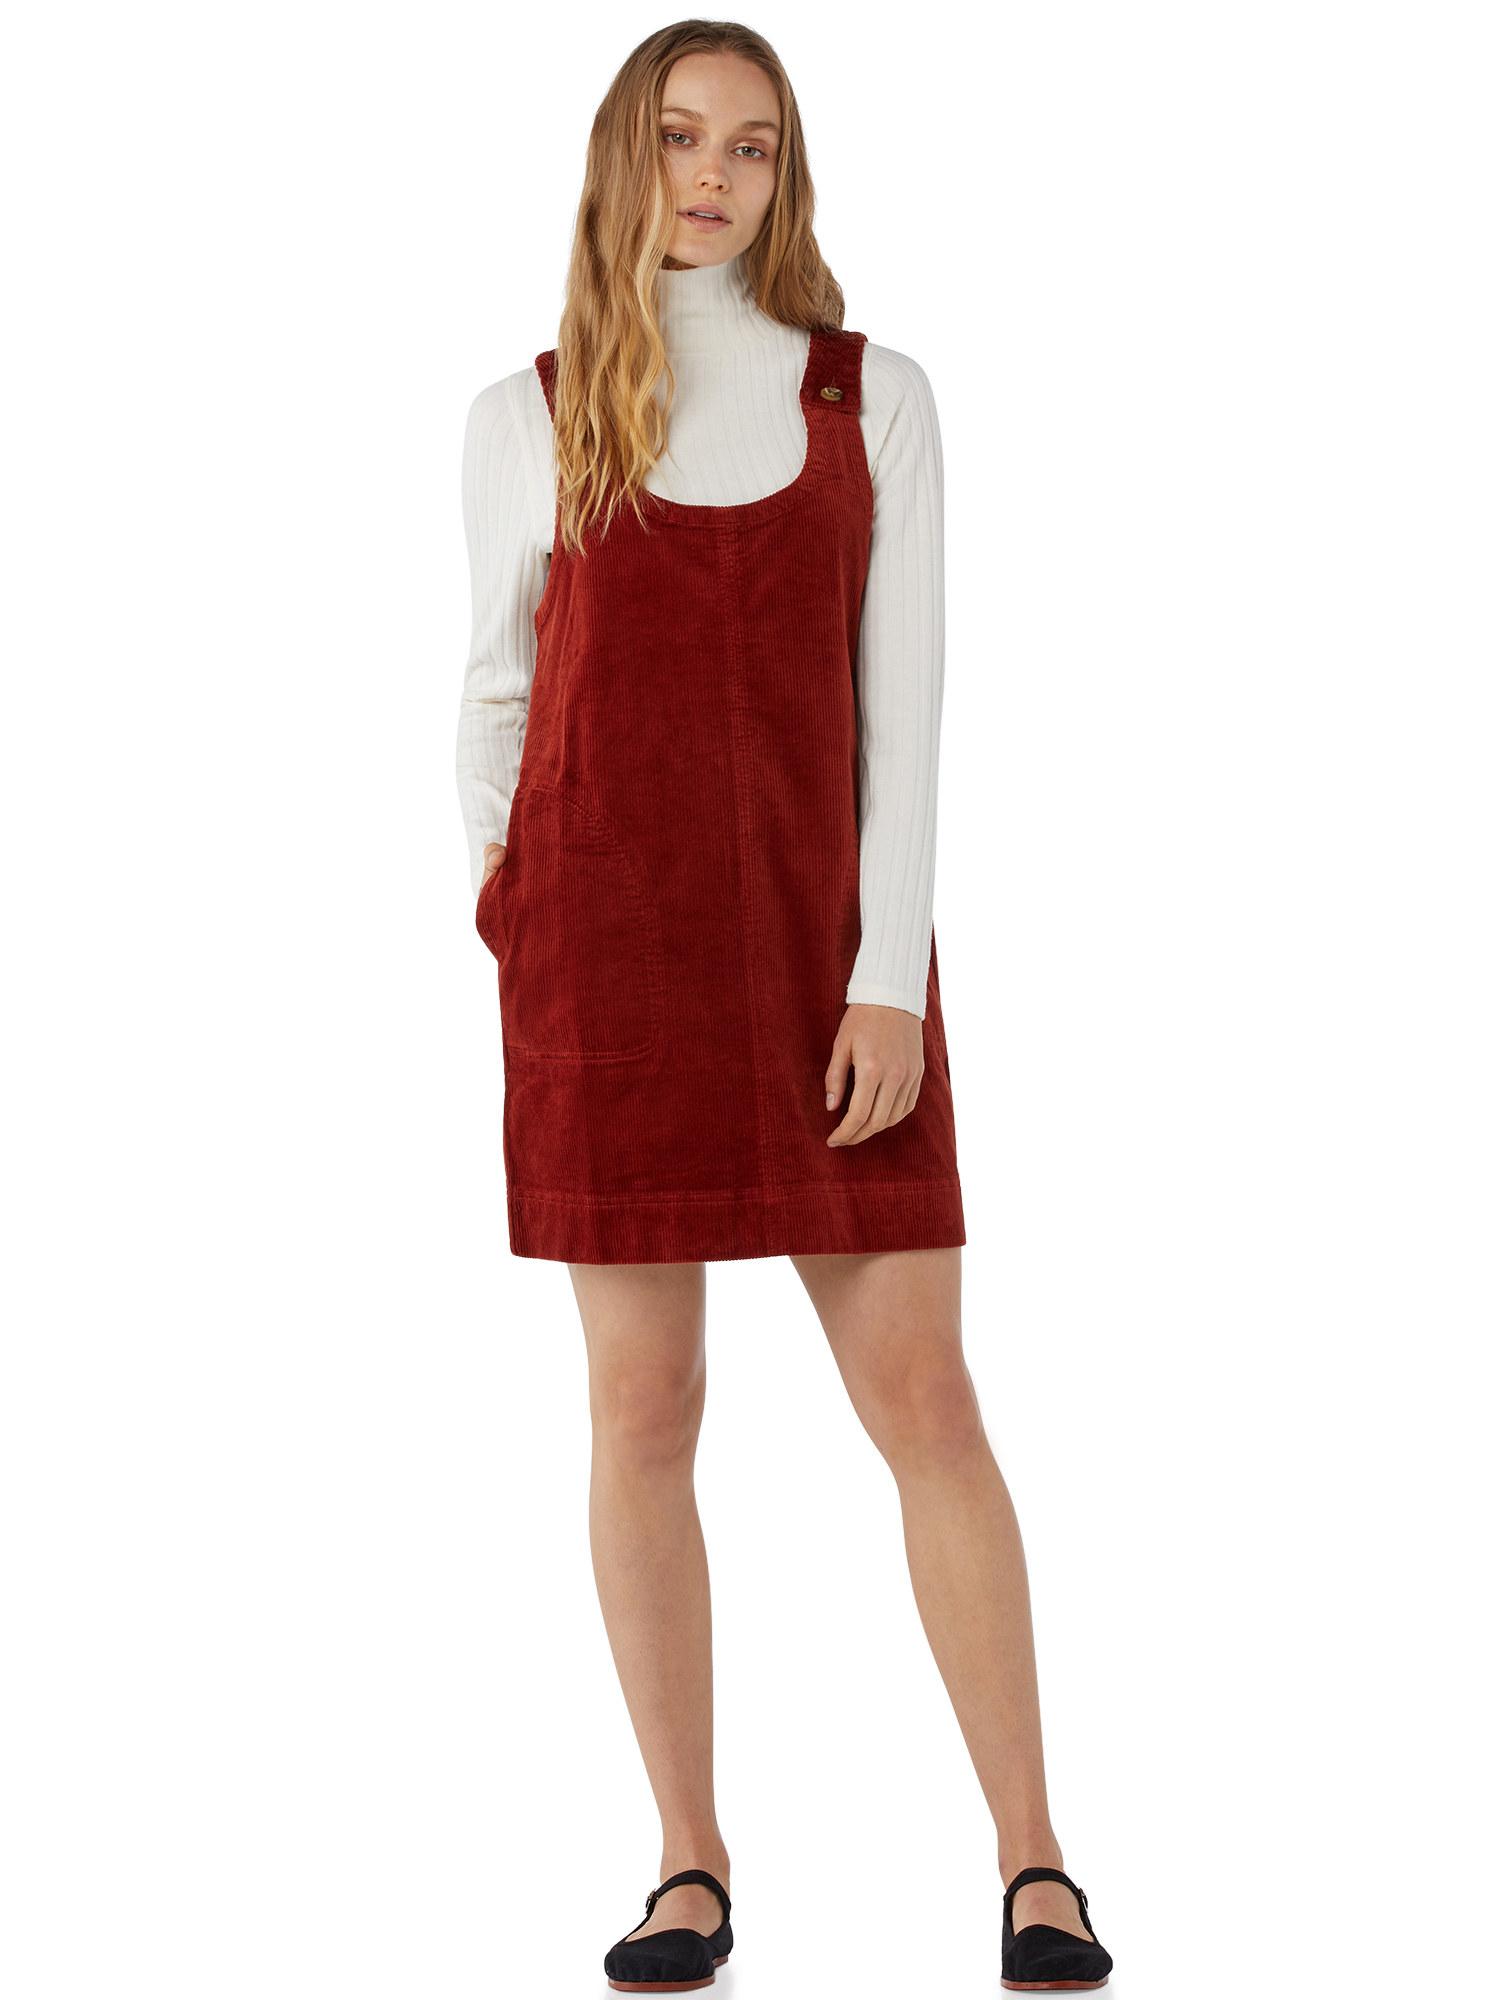 Model wearing rust-colored jumper dress